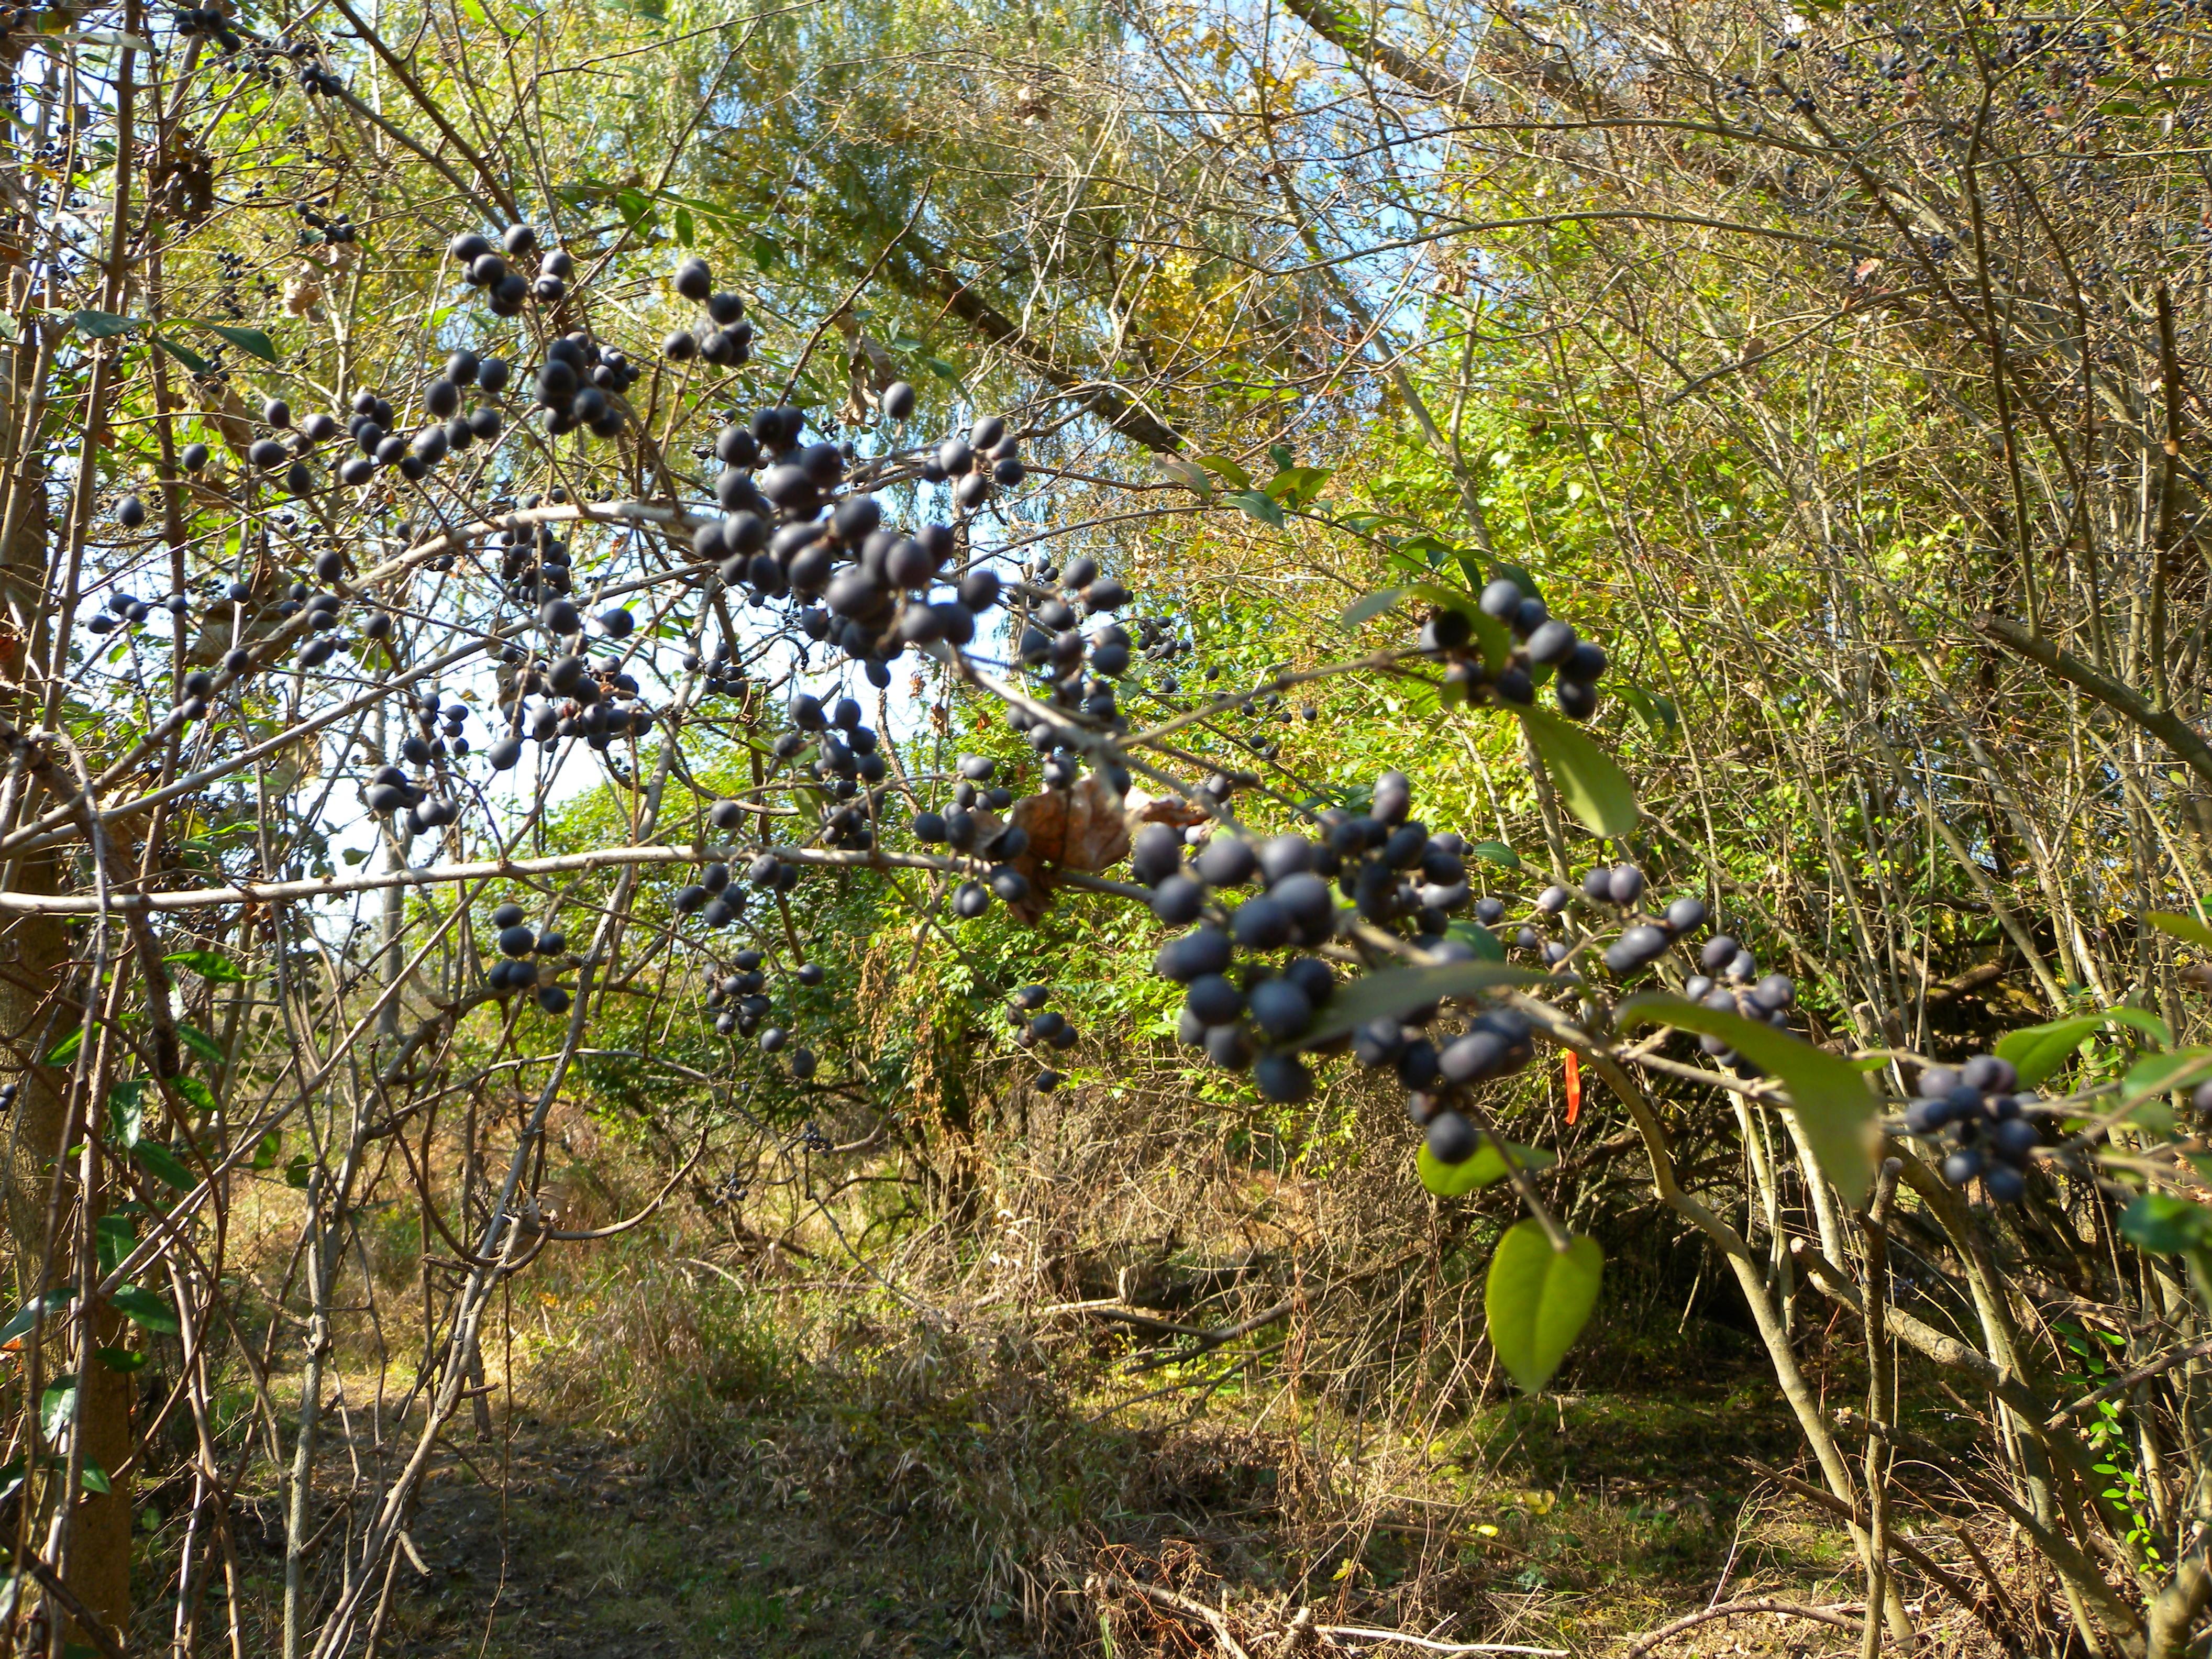 Berries galore in Early Successional Scrub Habitat.